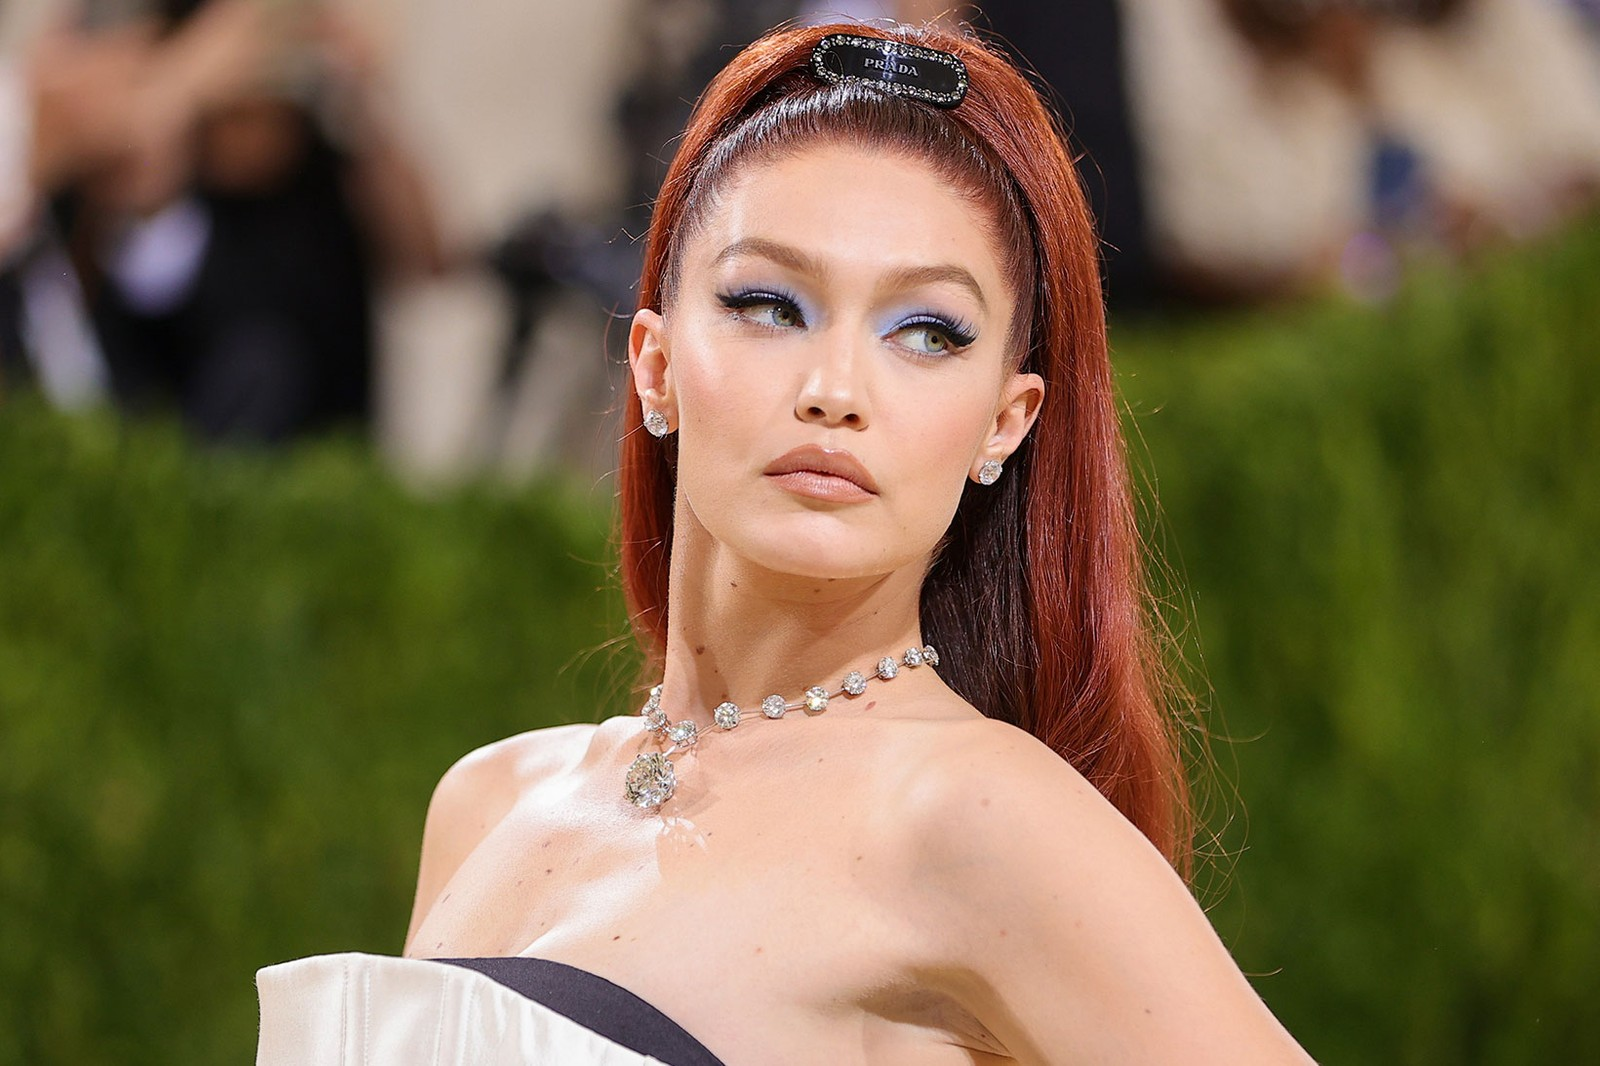 Met Gala Best Beauty Red Carpet Looks Hair Makeup Rihanna Megan Fox Billie Eilish